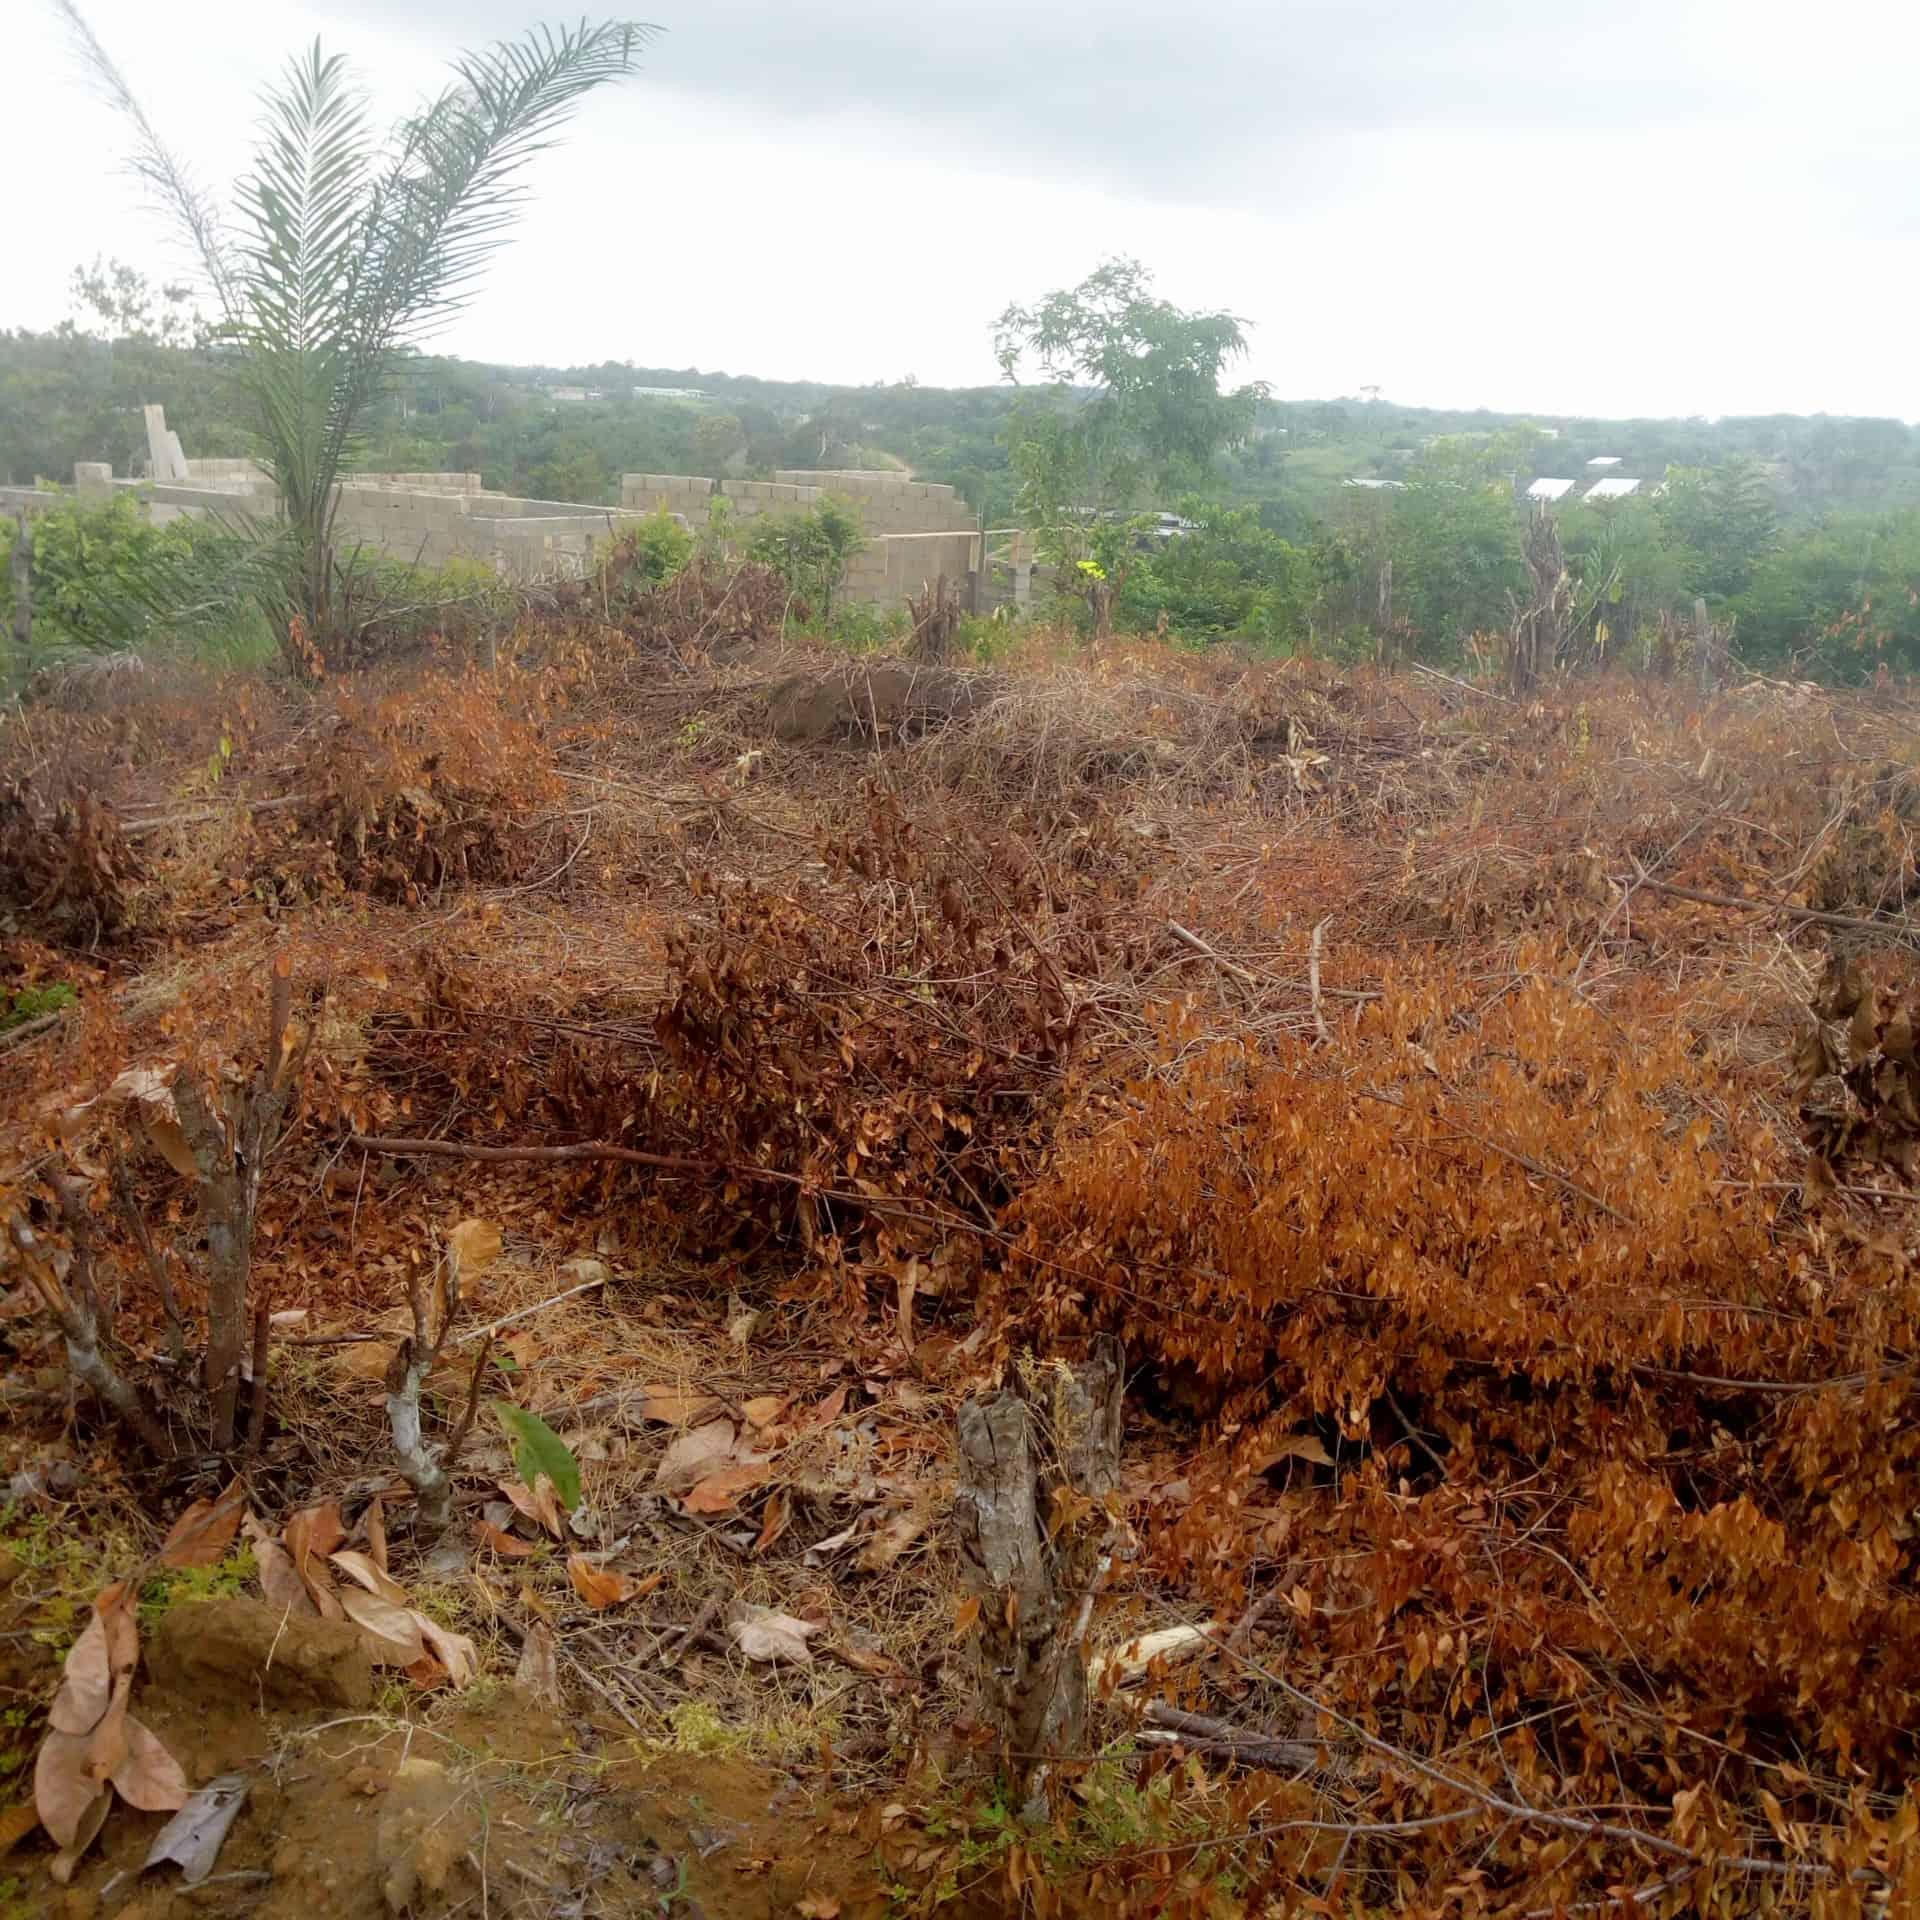 Land for sale at Douala, Akwa I, Nkolbon et église - 2000 m2 - 20 000 000 FCFA